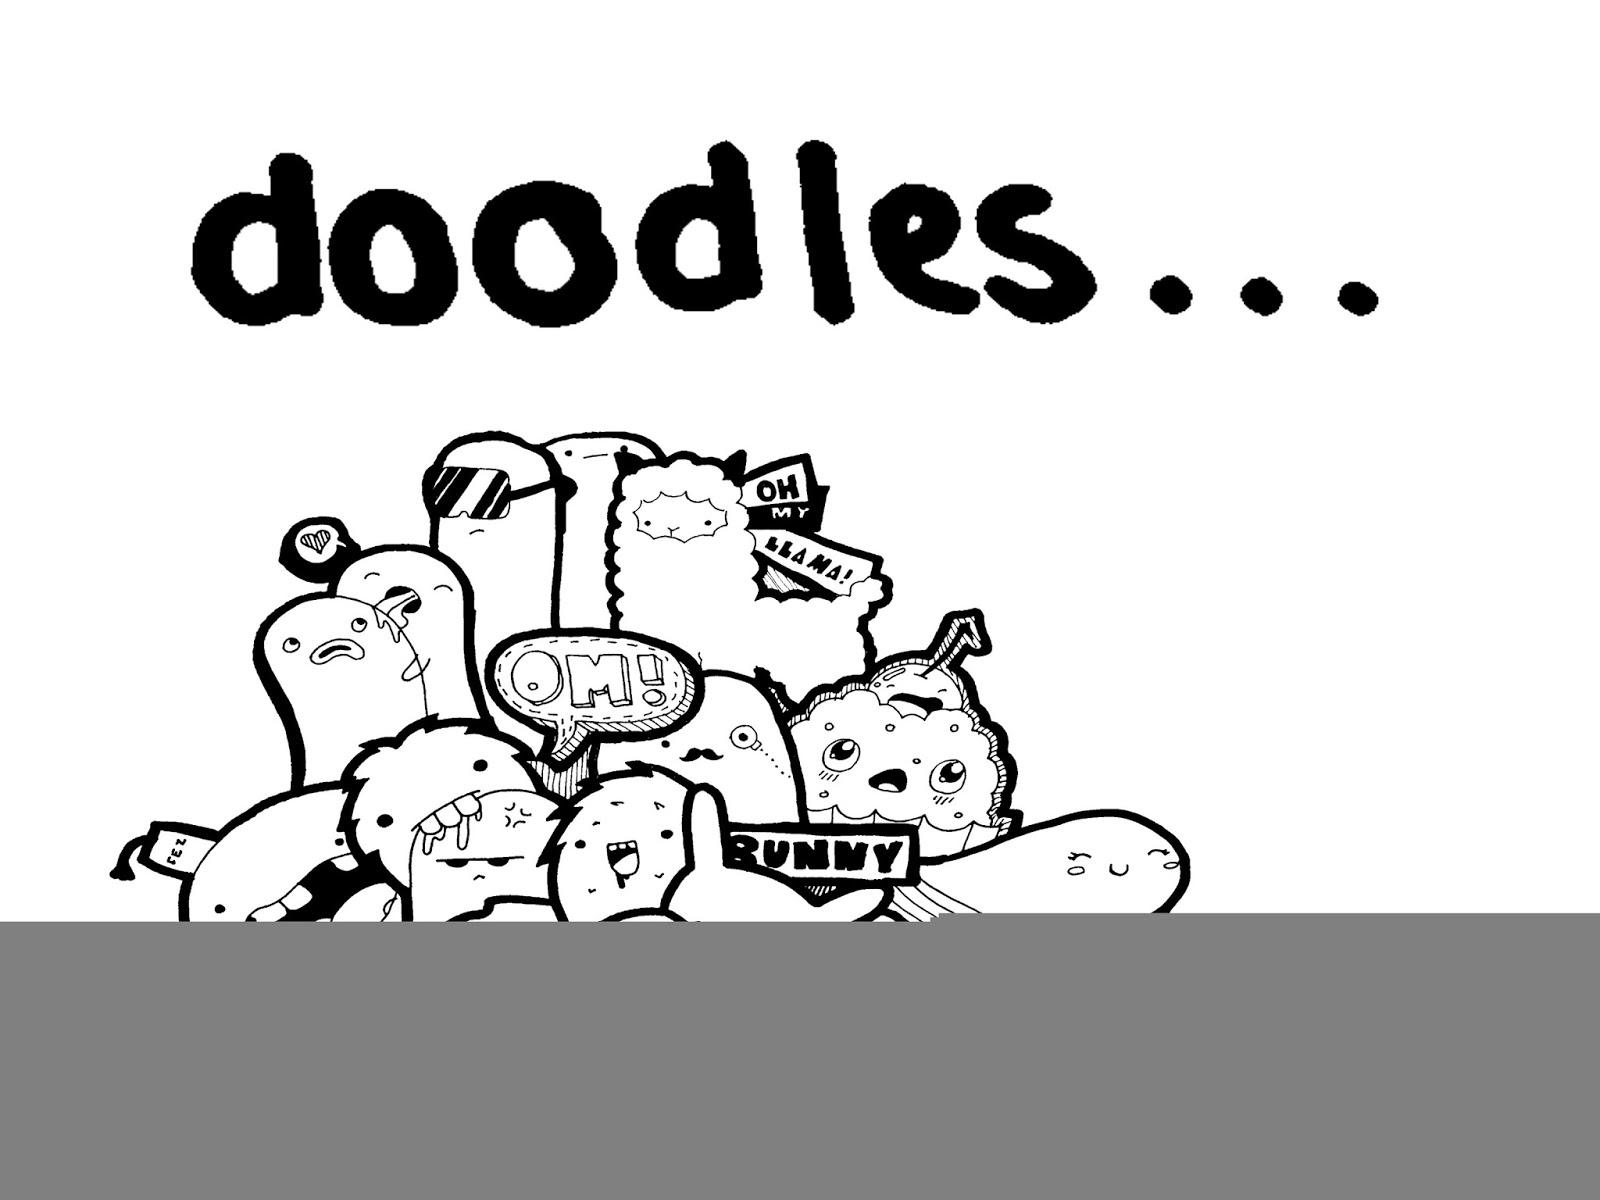 Contoh Gambar Doodle Yg Paling Mudah Ditiru Kantor Meme